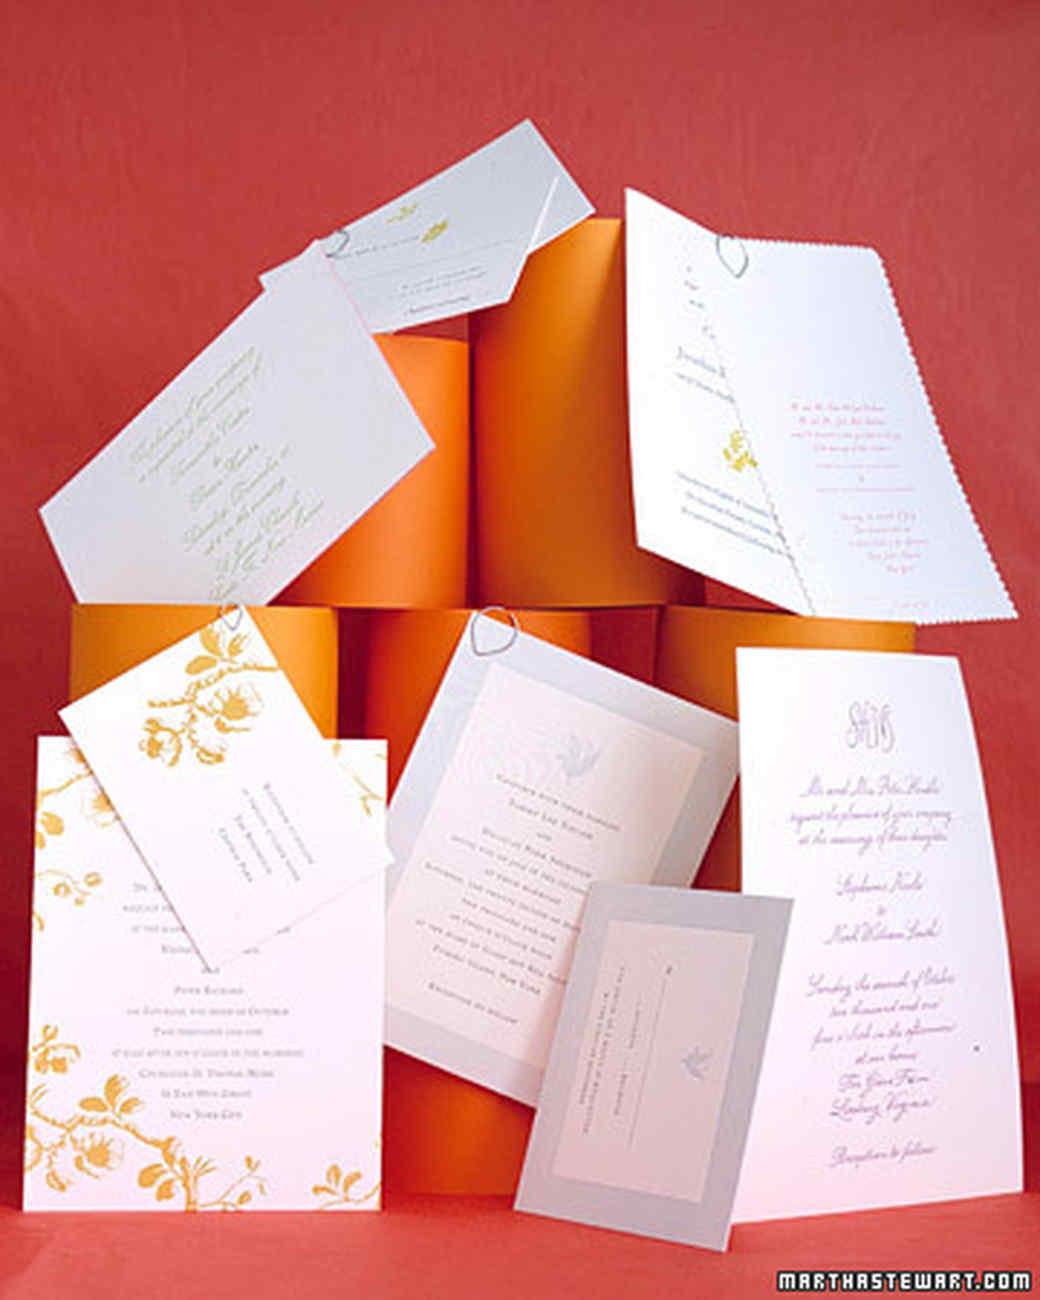 Invitations in Color | Martha Stewart